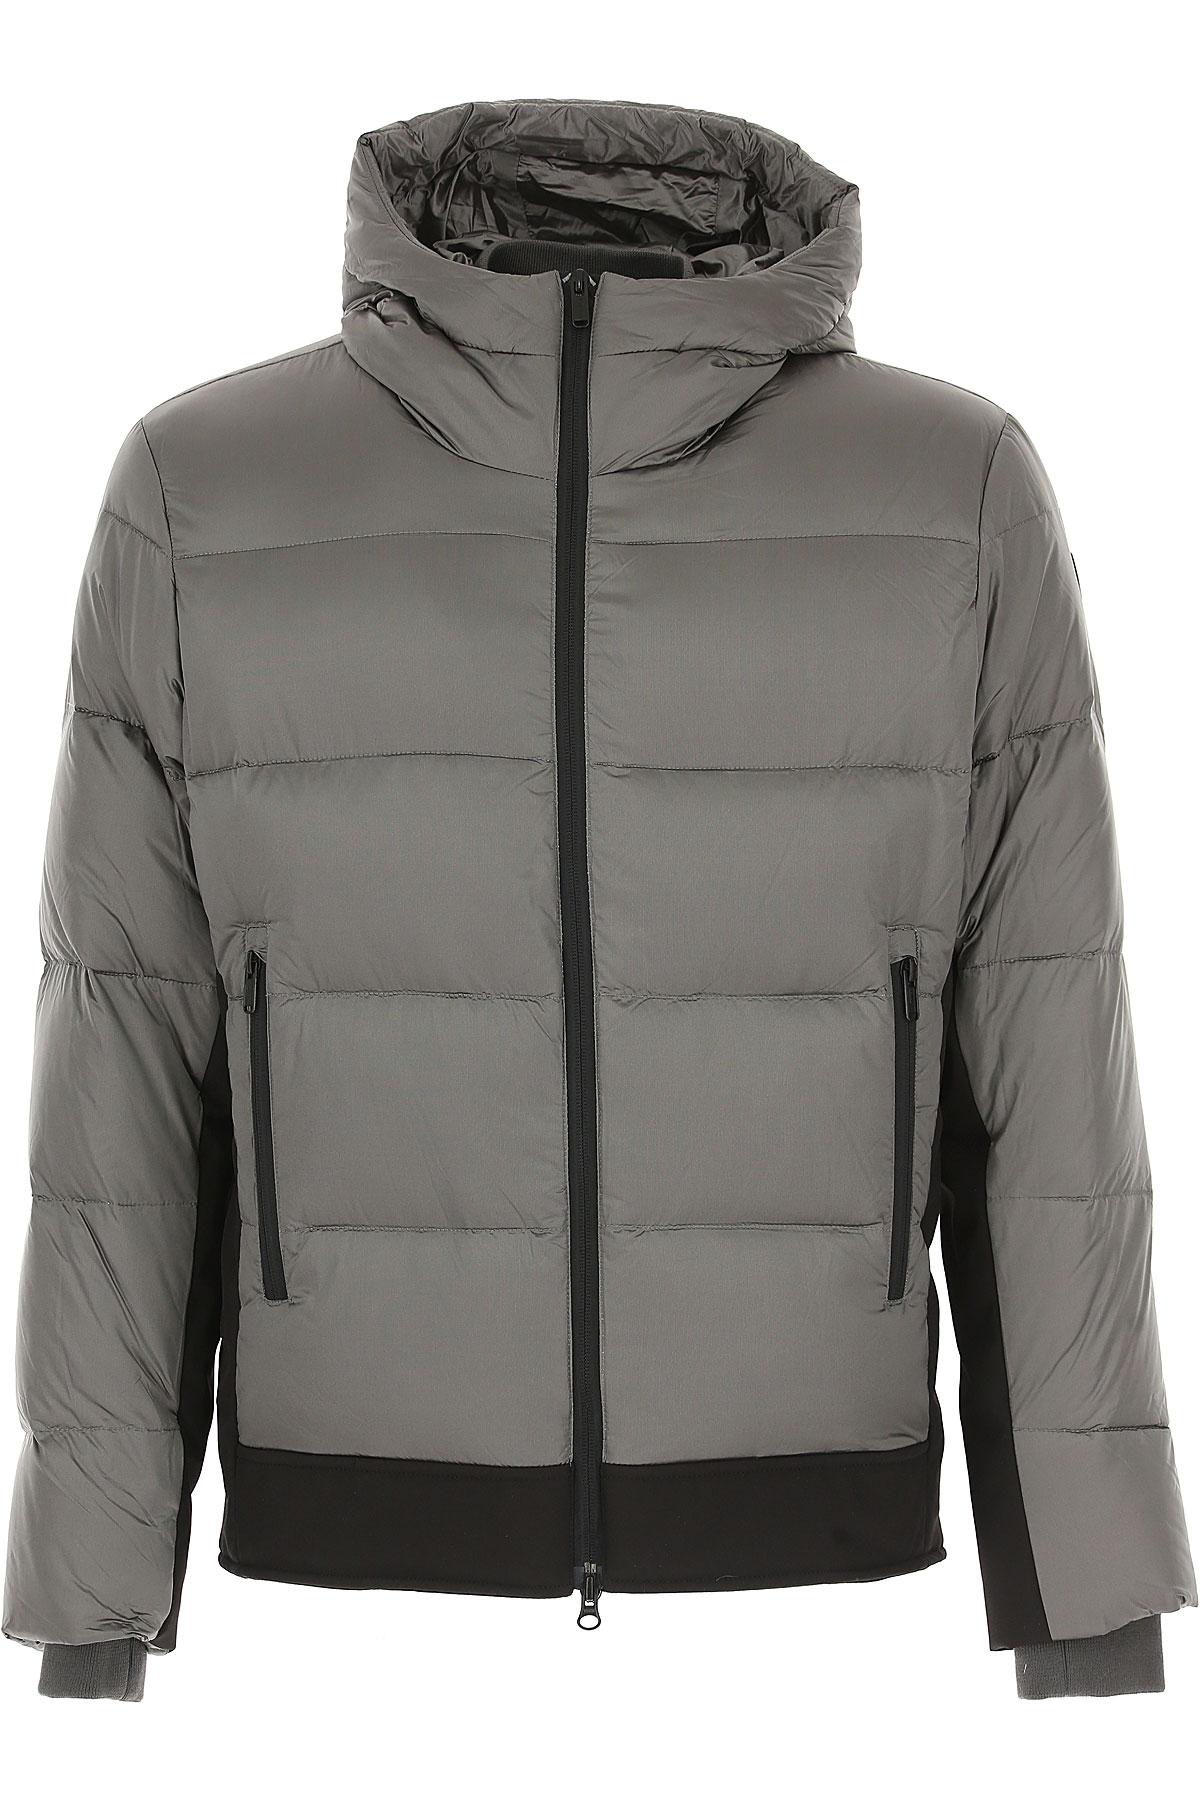 Image of Bomboogie Down Jacket for Men, Puffer Ski Jacket, Grey, Down, 2017, L M S XL XXL XXXL